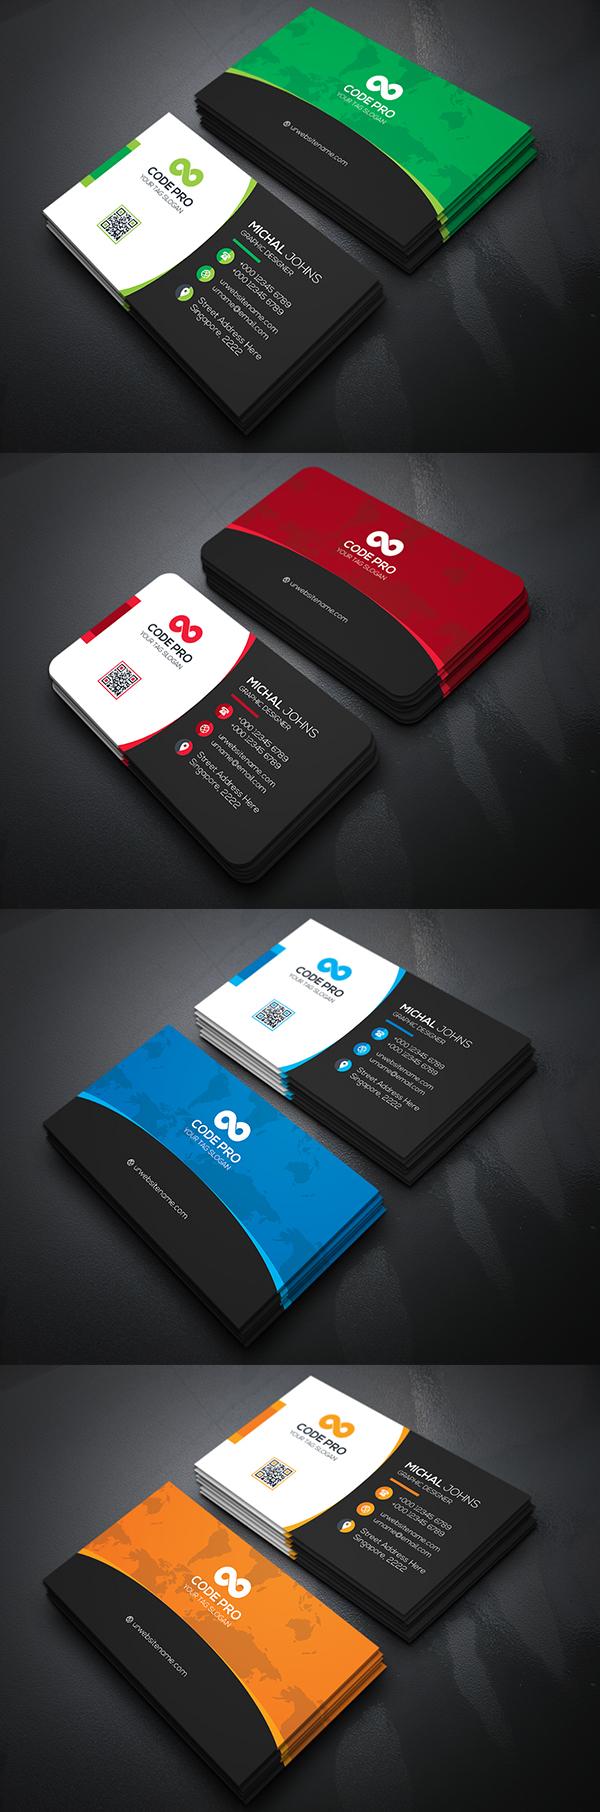 12 Business Card Design